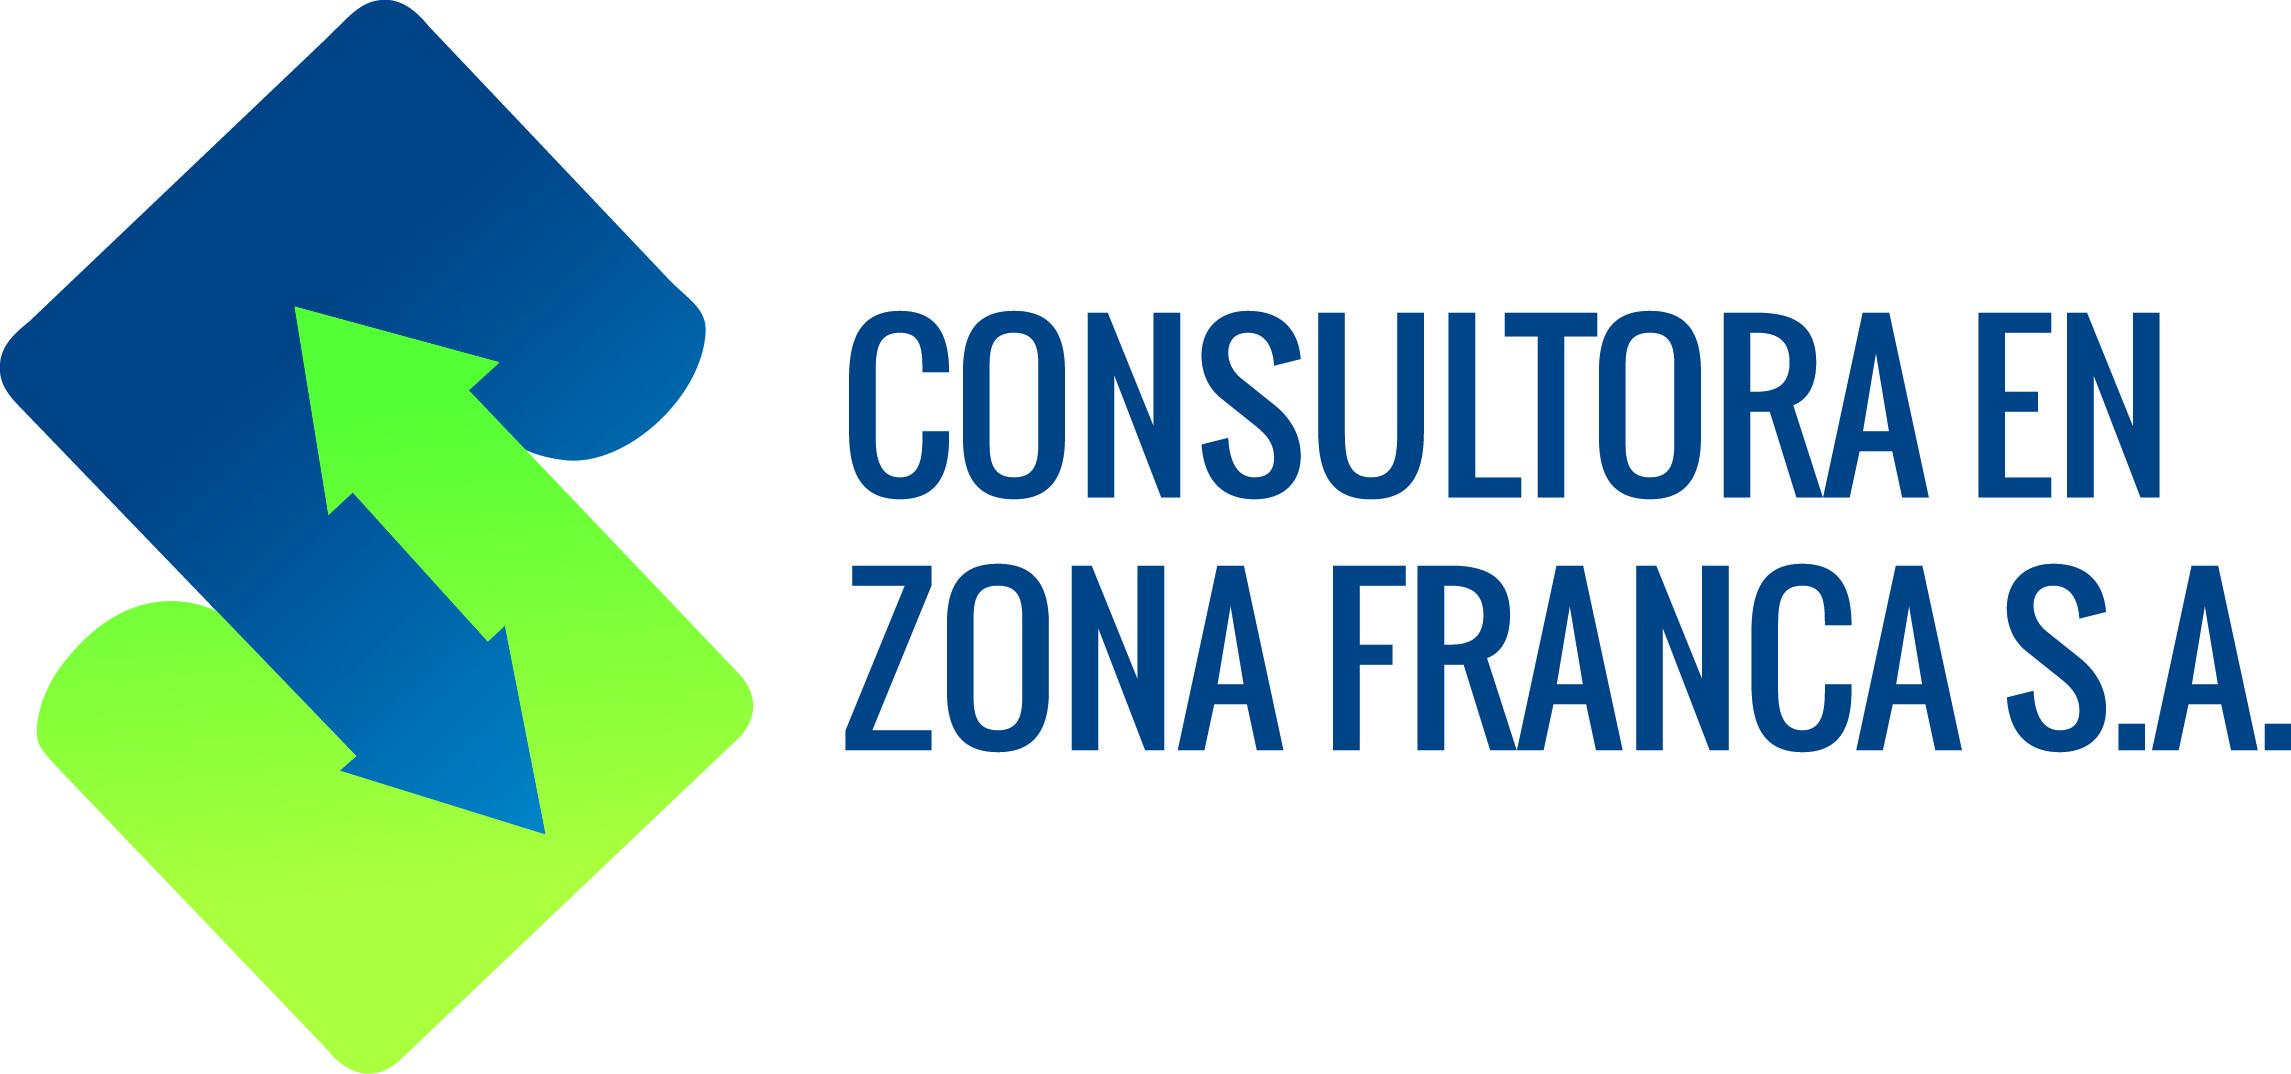 Empresas Desafio10x: Conzultora en Zona Franca